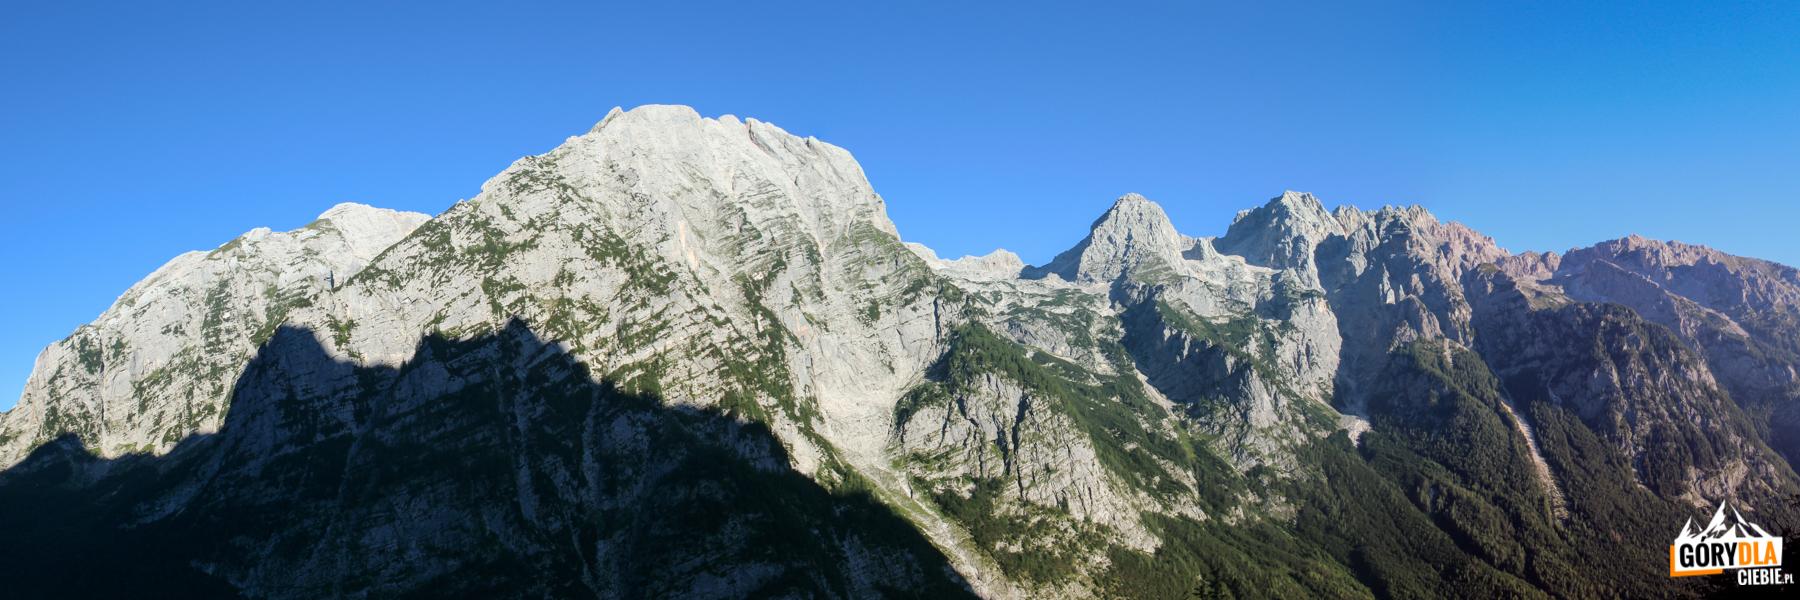 "Panorama z drogi ""Tominškova pot"" na przeciwległą stronę Doliny Vrata - Stenar (2502 m), Dolkova špica (2591 m) i Škrlatica (2740 m)"